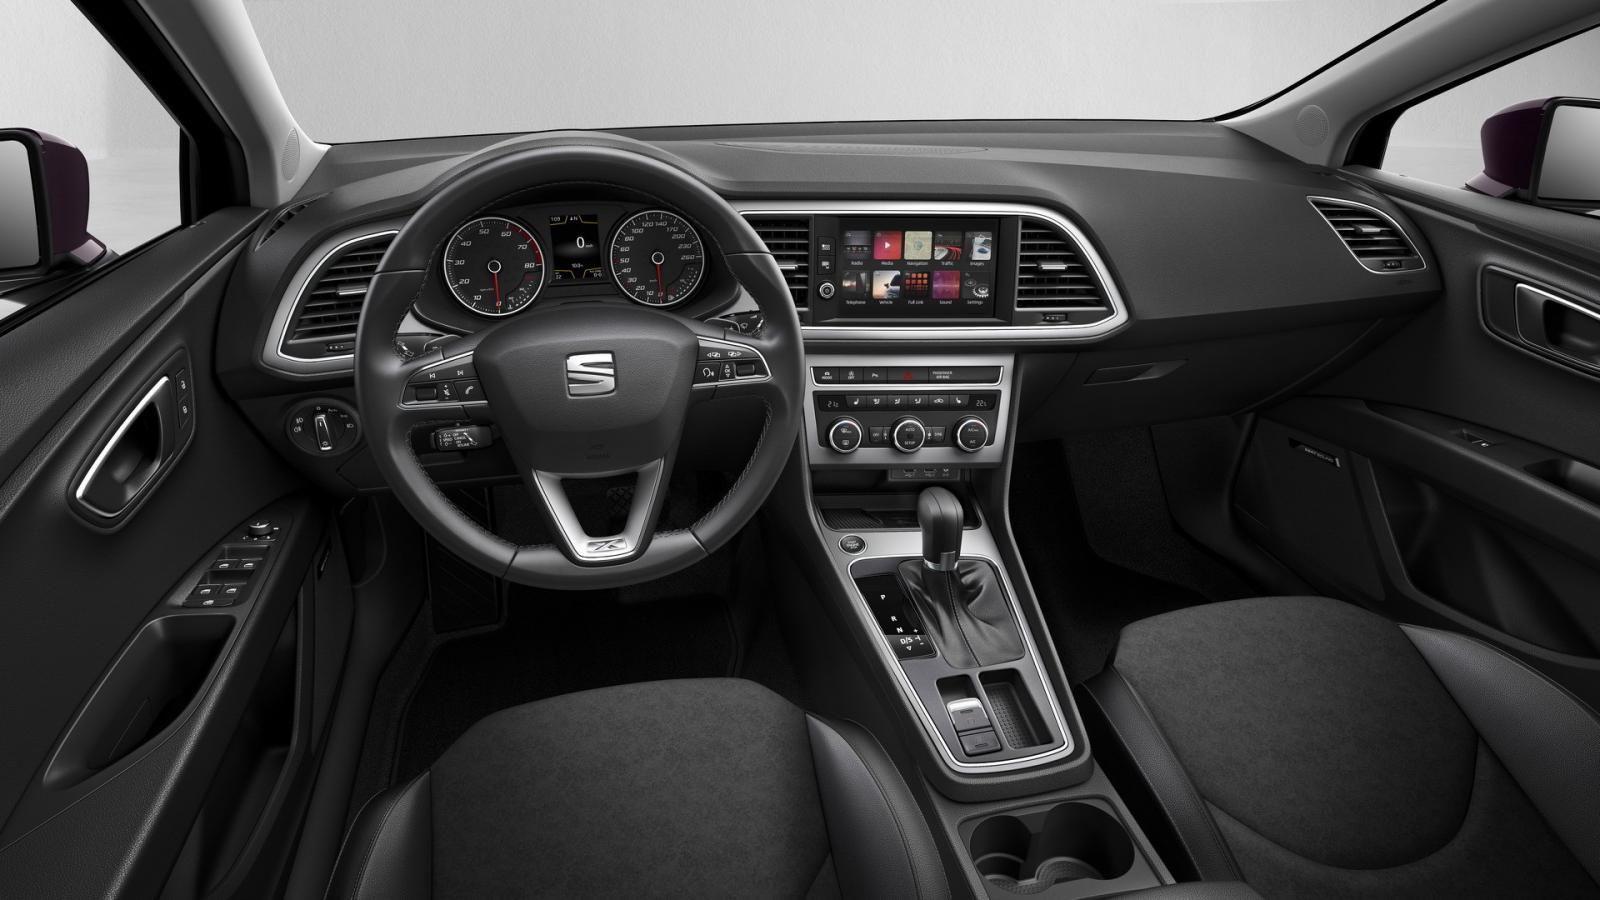 Представлен SEAT Leon 2017 модельного года